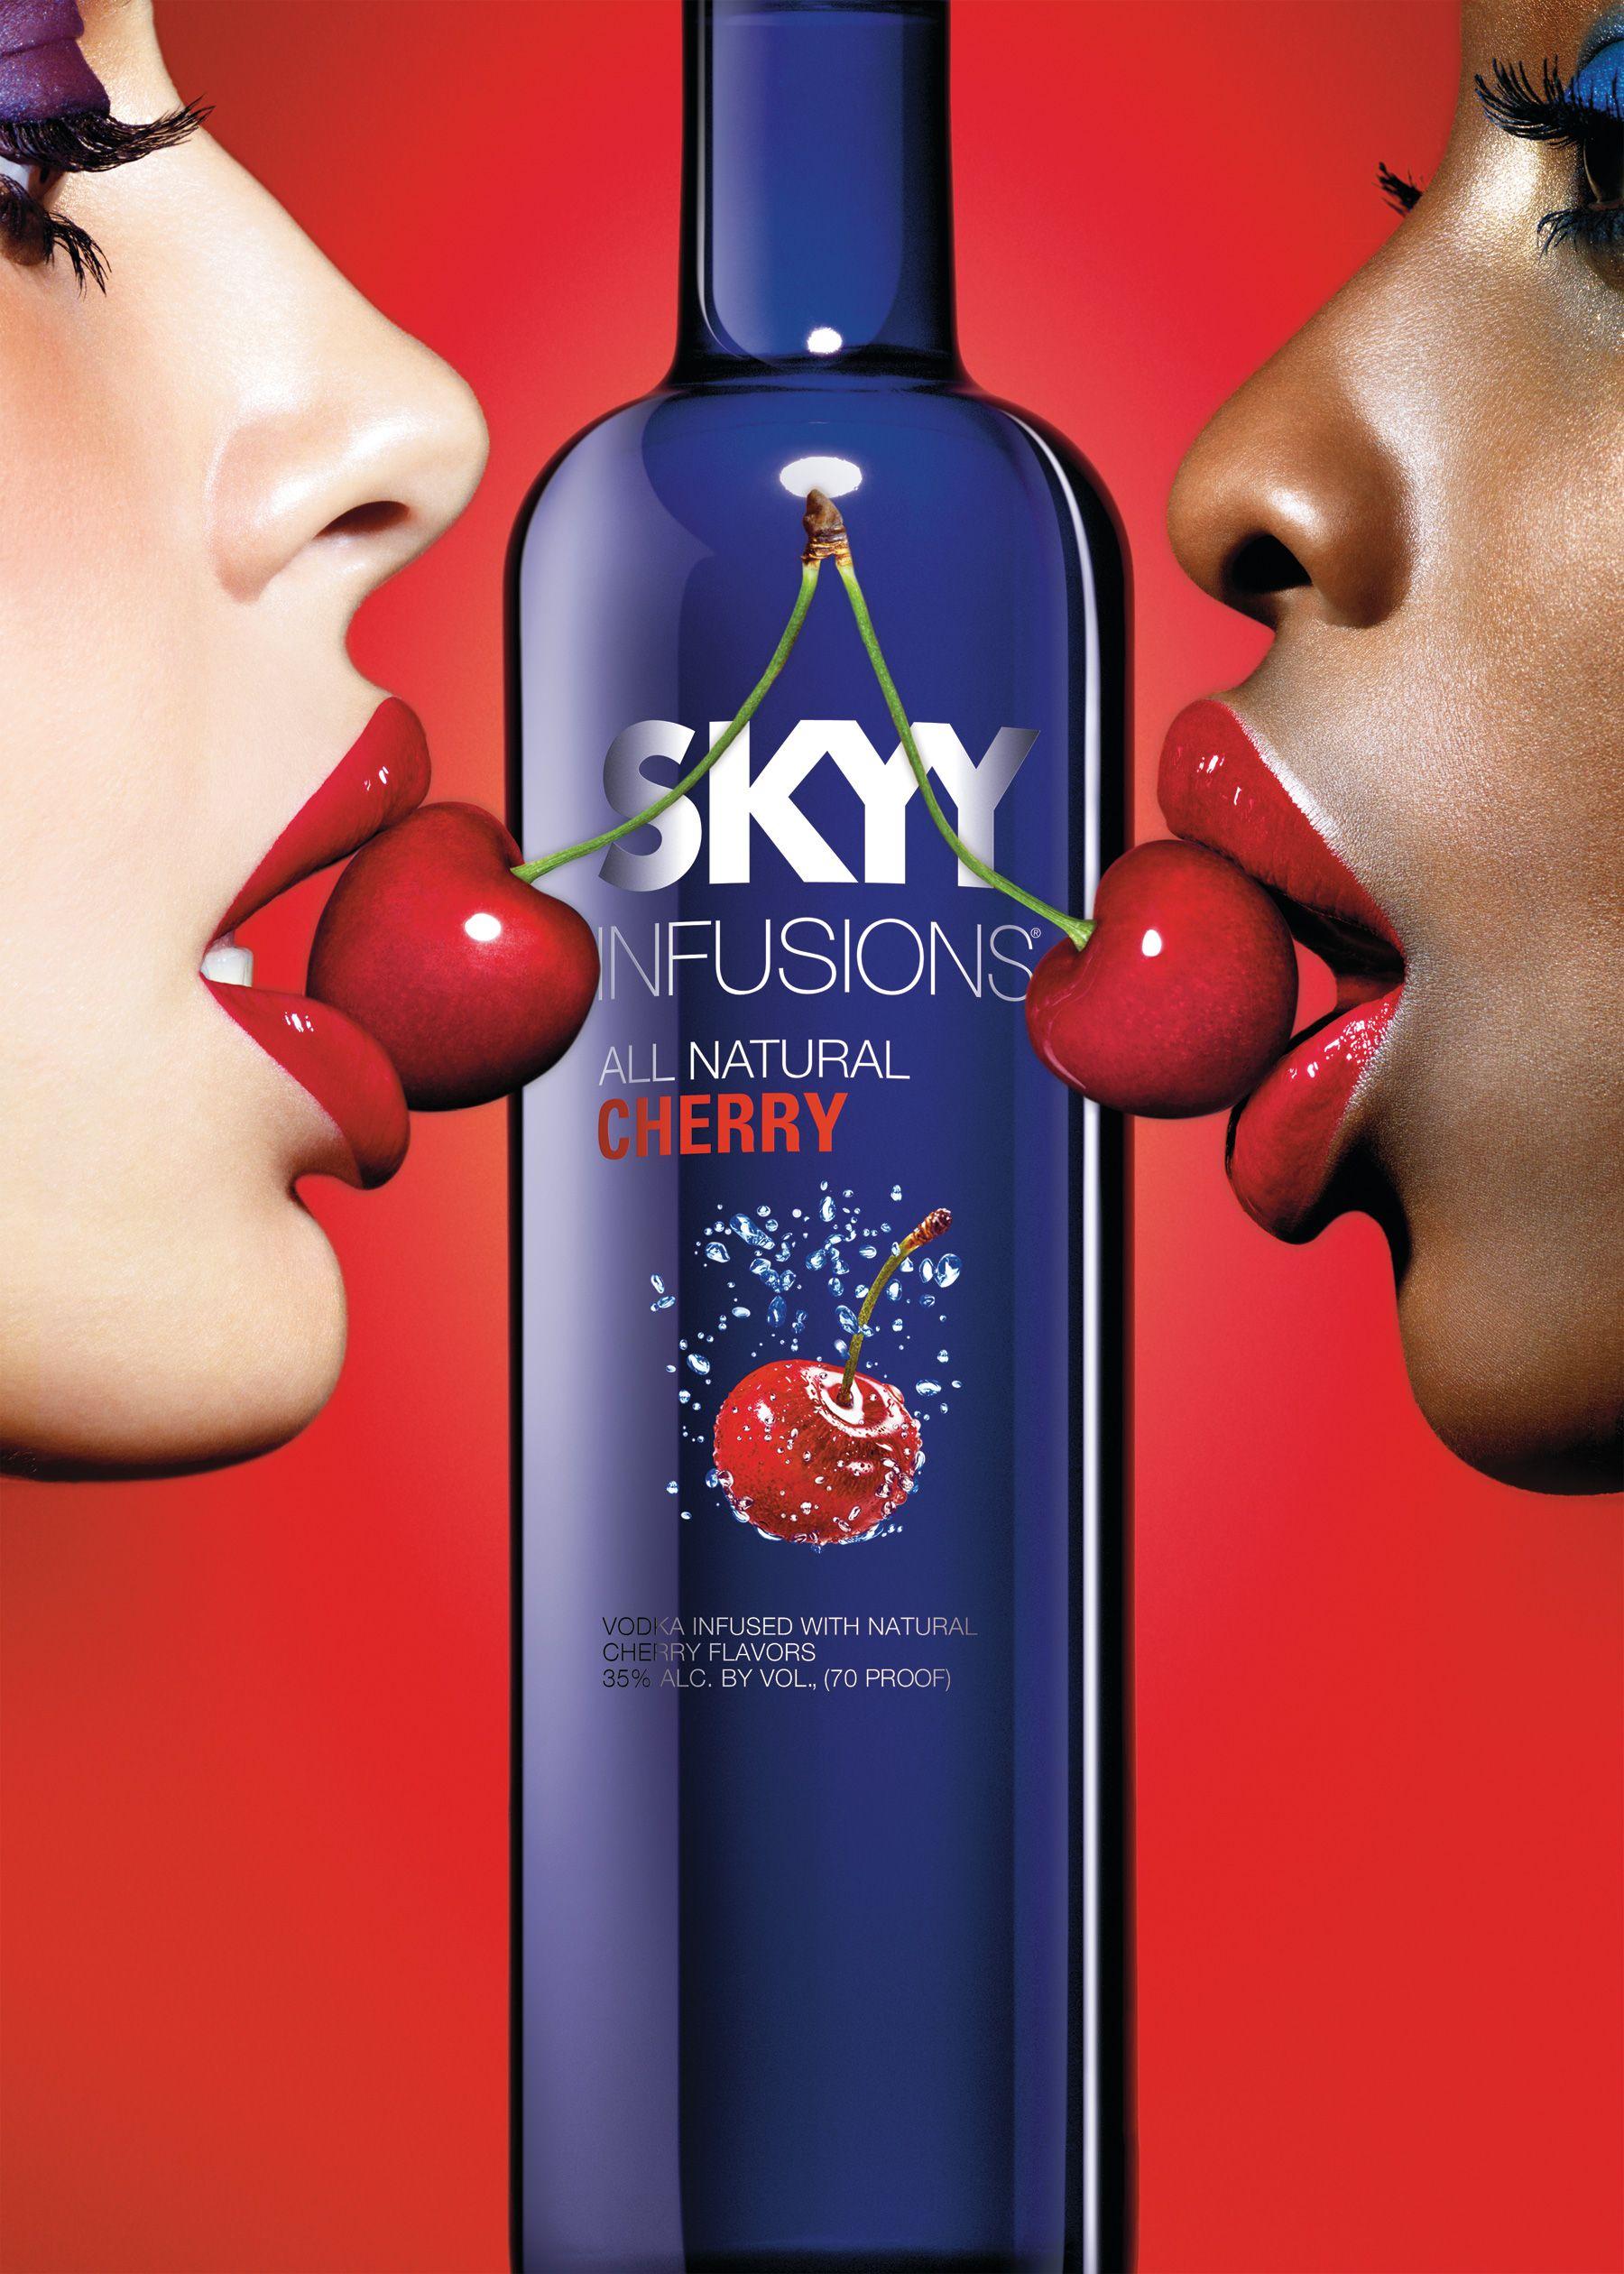 Skyy Cherry Vodka Mixed With Coke Is My Favorite But Dangerous Taste Just Like Cherry Coke Skyy Vodka Vodka Cherry Vodka